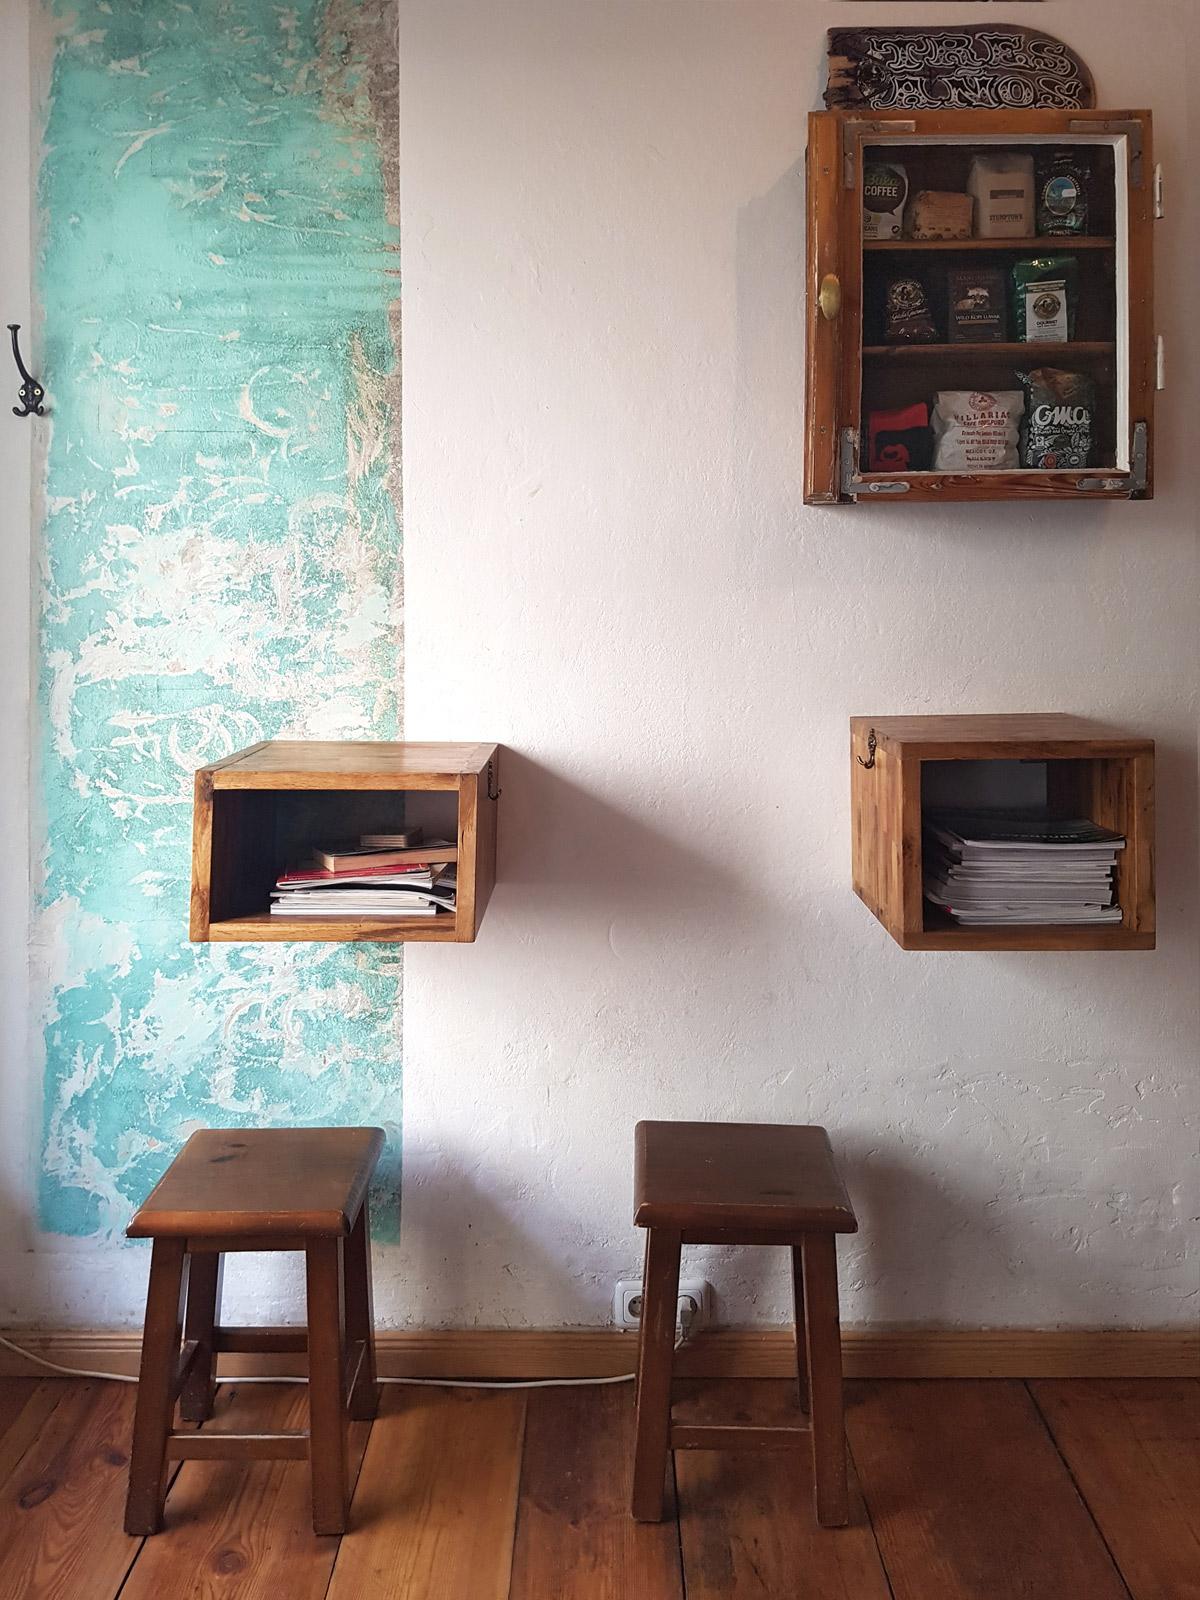 Mi Onda Coffee Shop in Berlin